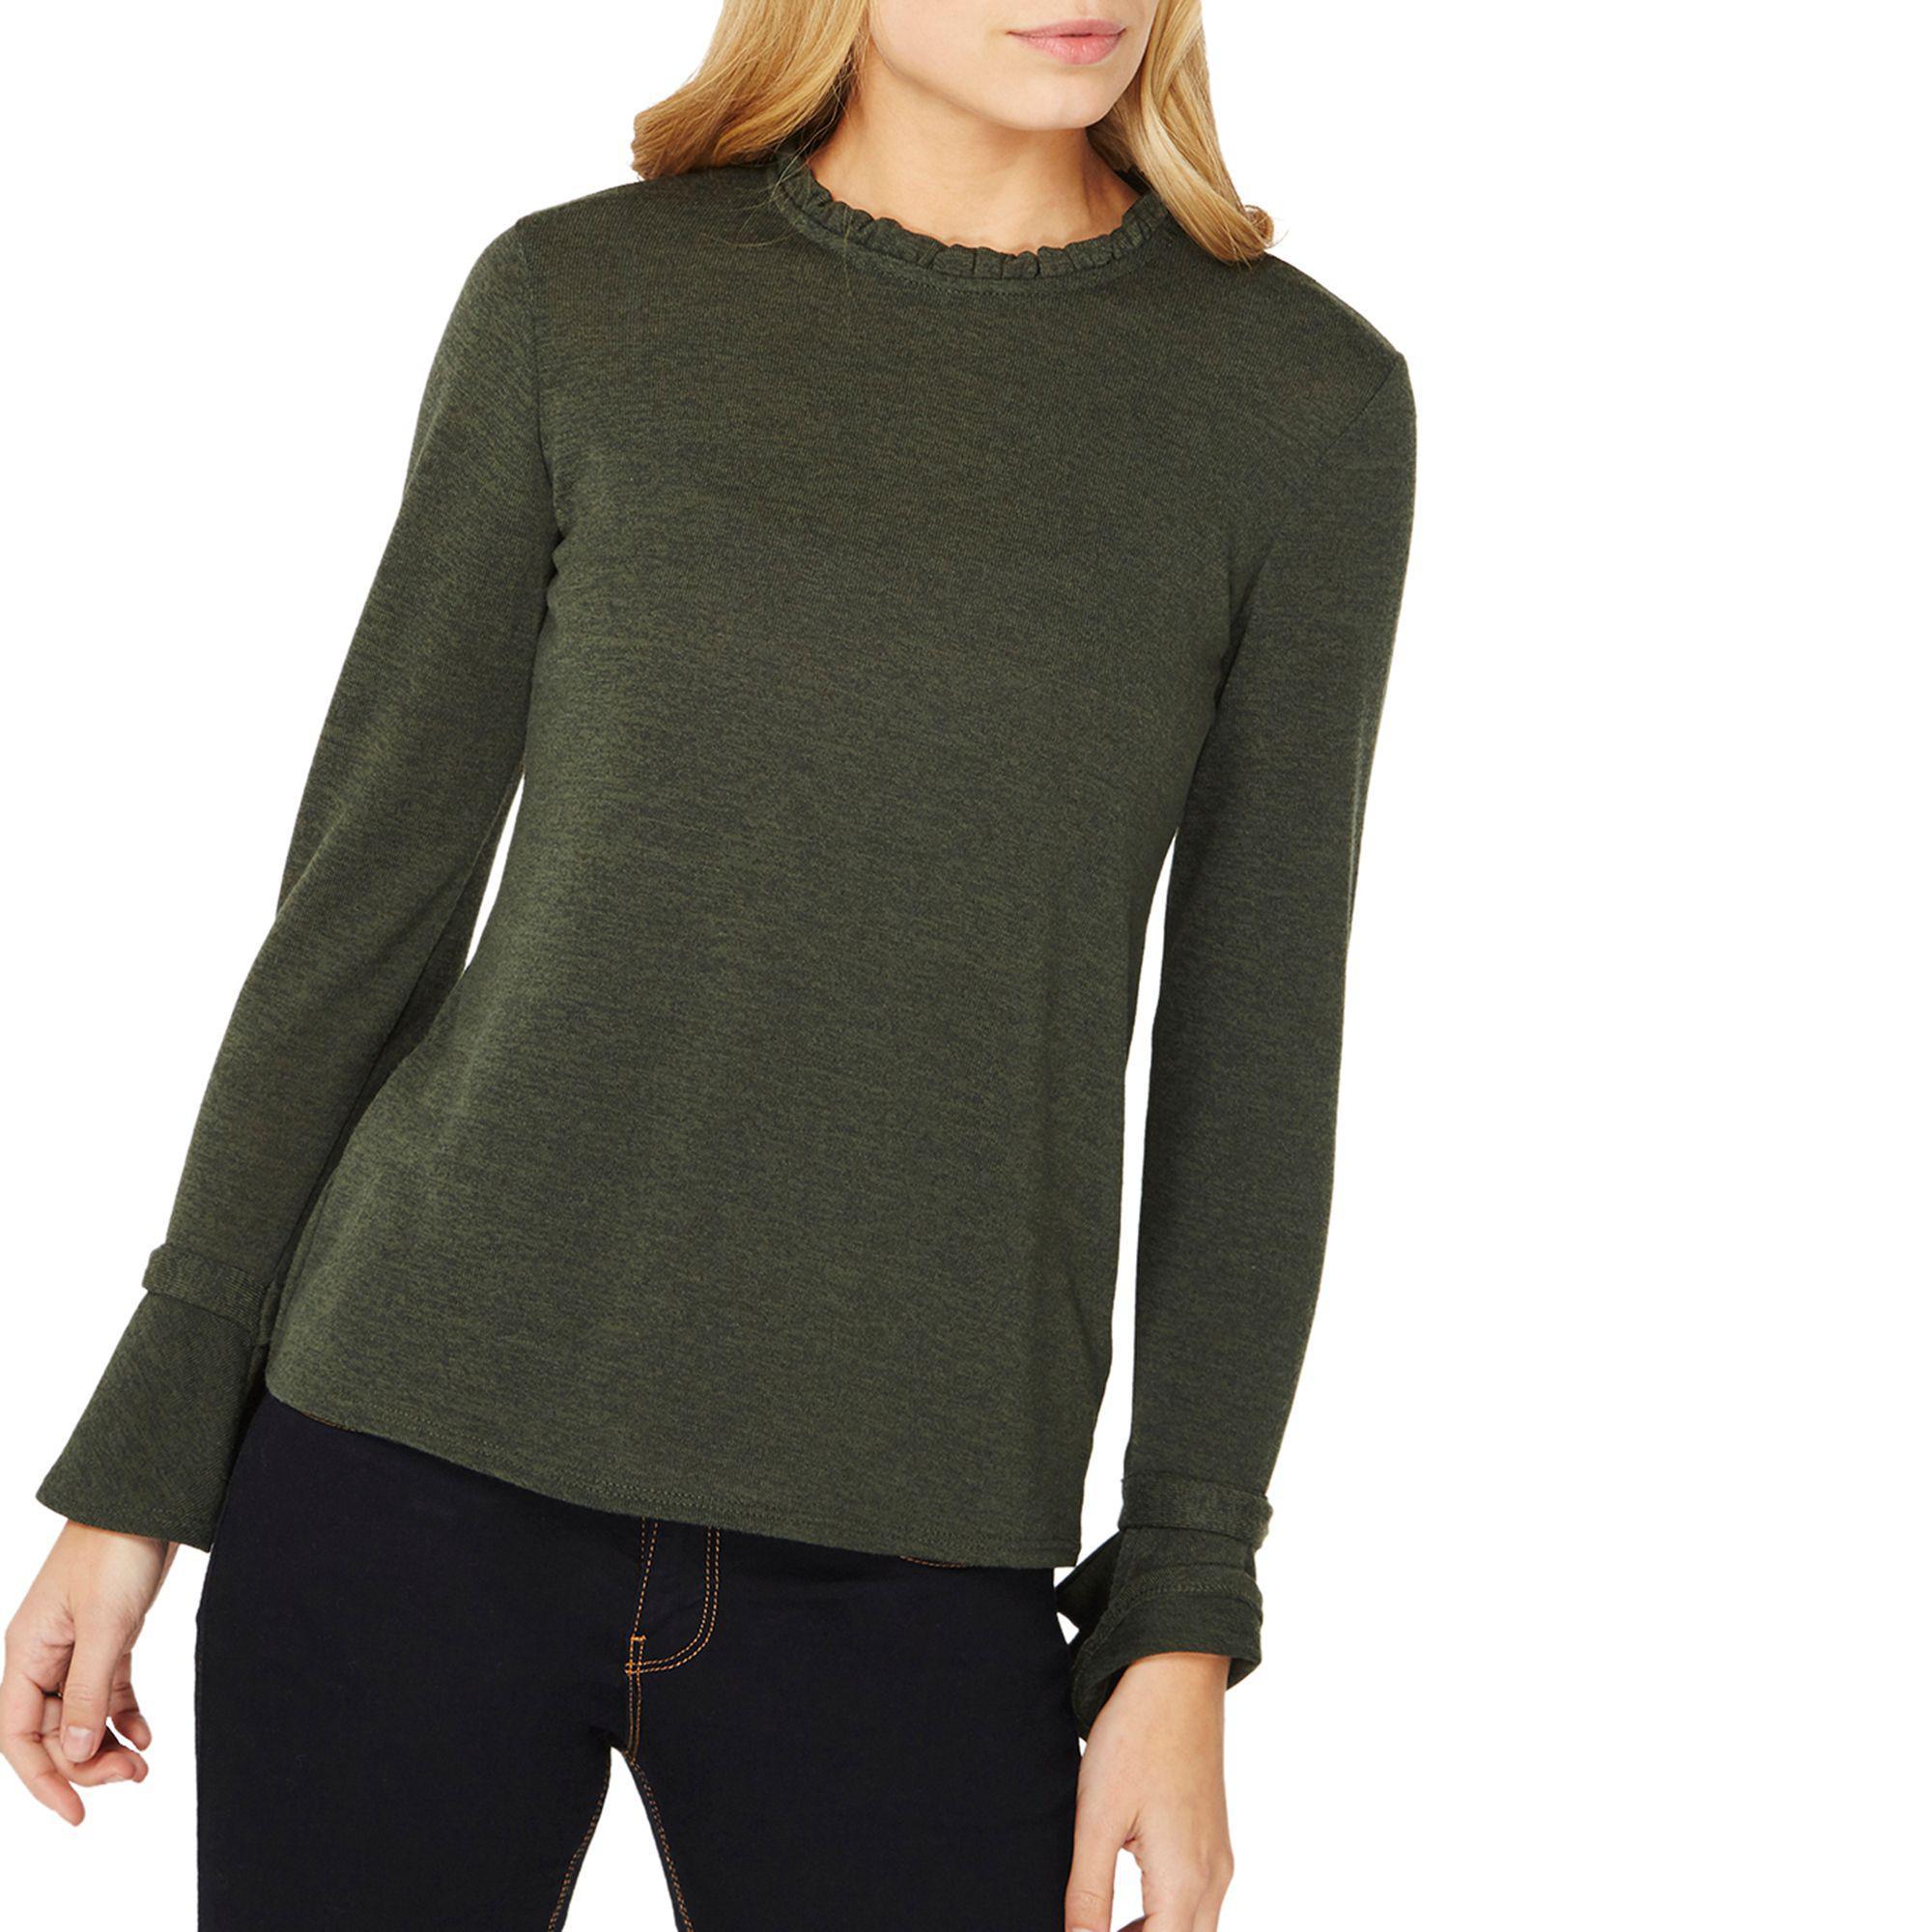 Green Dorothy In Crust Tie Top Sleeves Perkins Khaki Pie Lyst rqgw8Zr